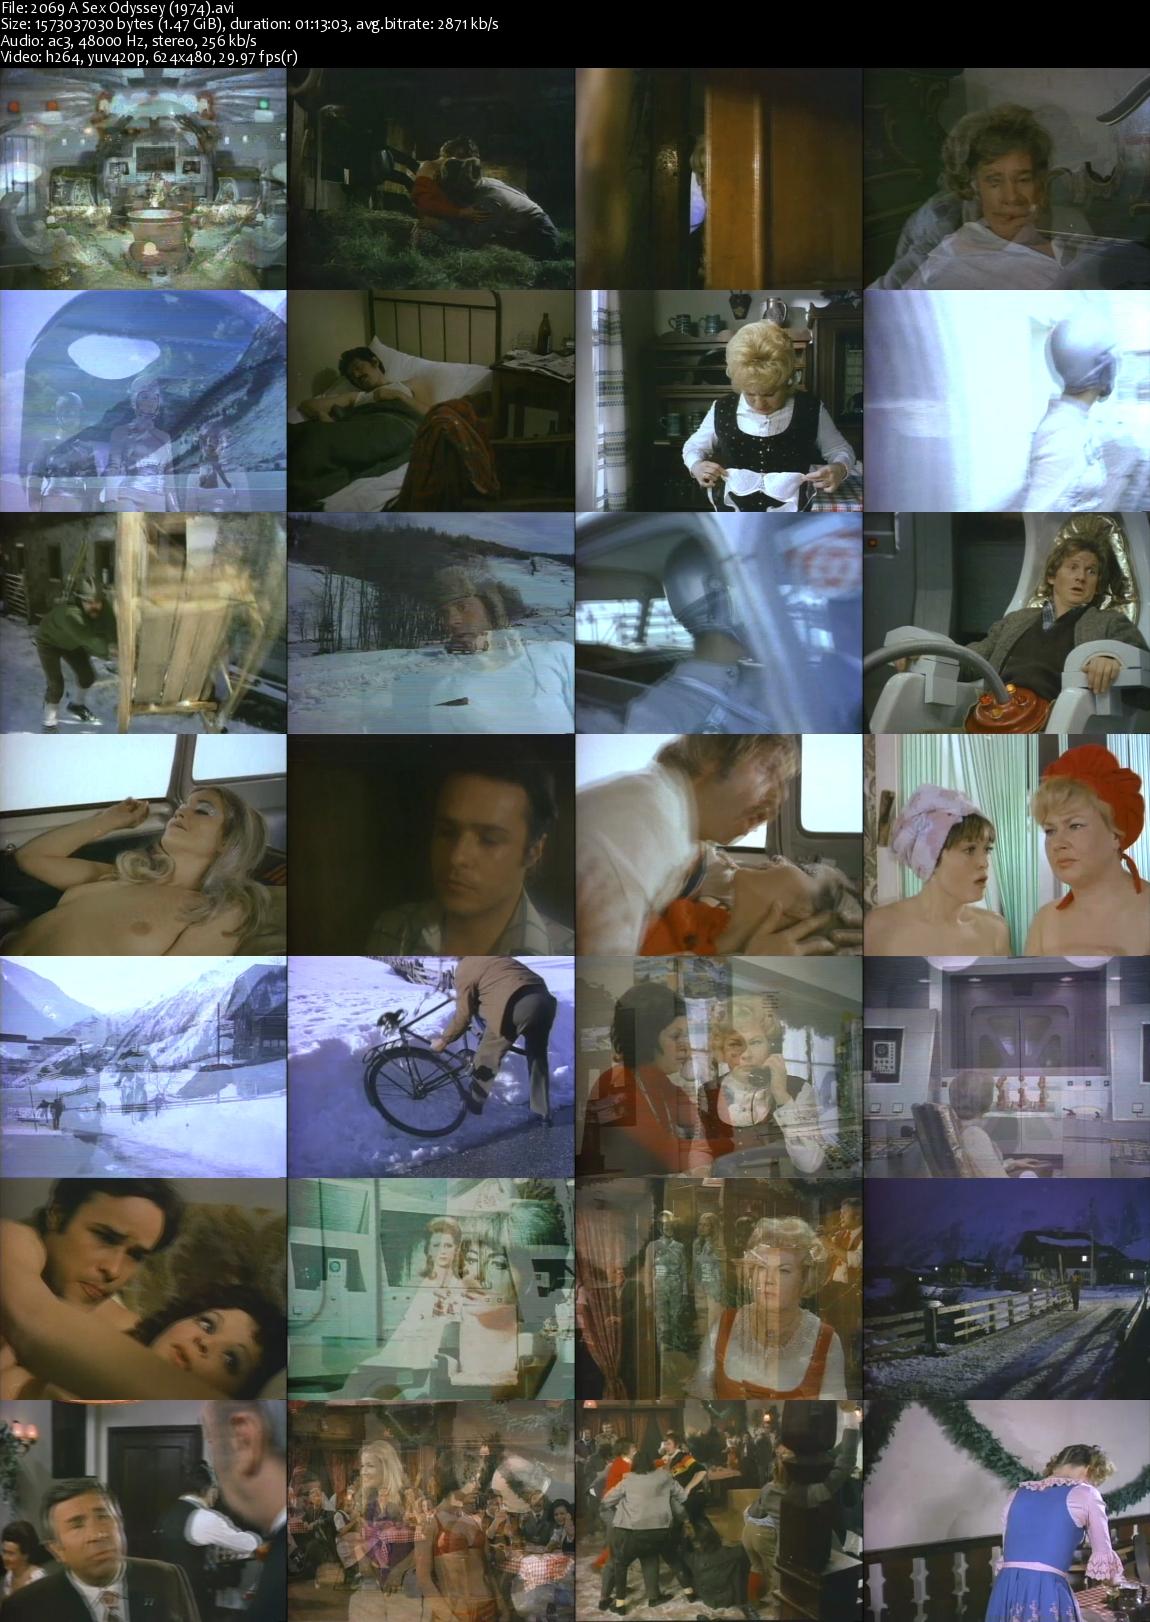 Taboo 2001 a sex odyssey torrent